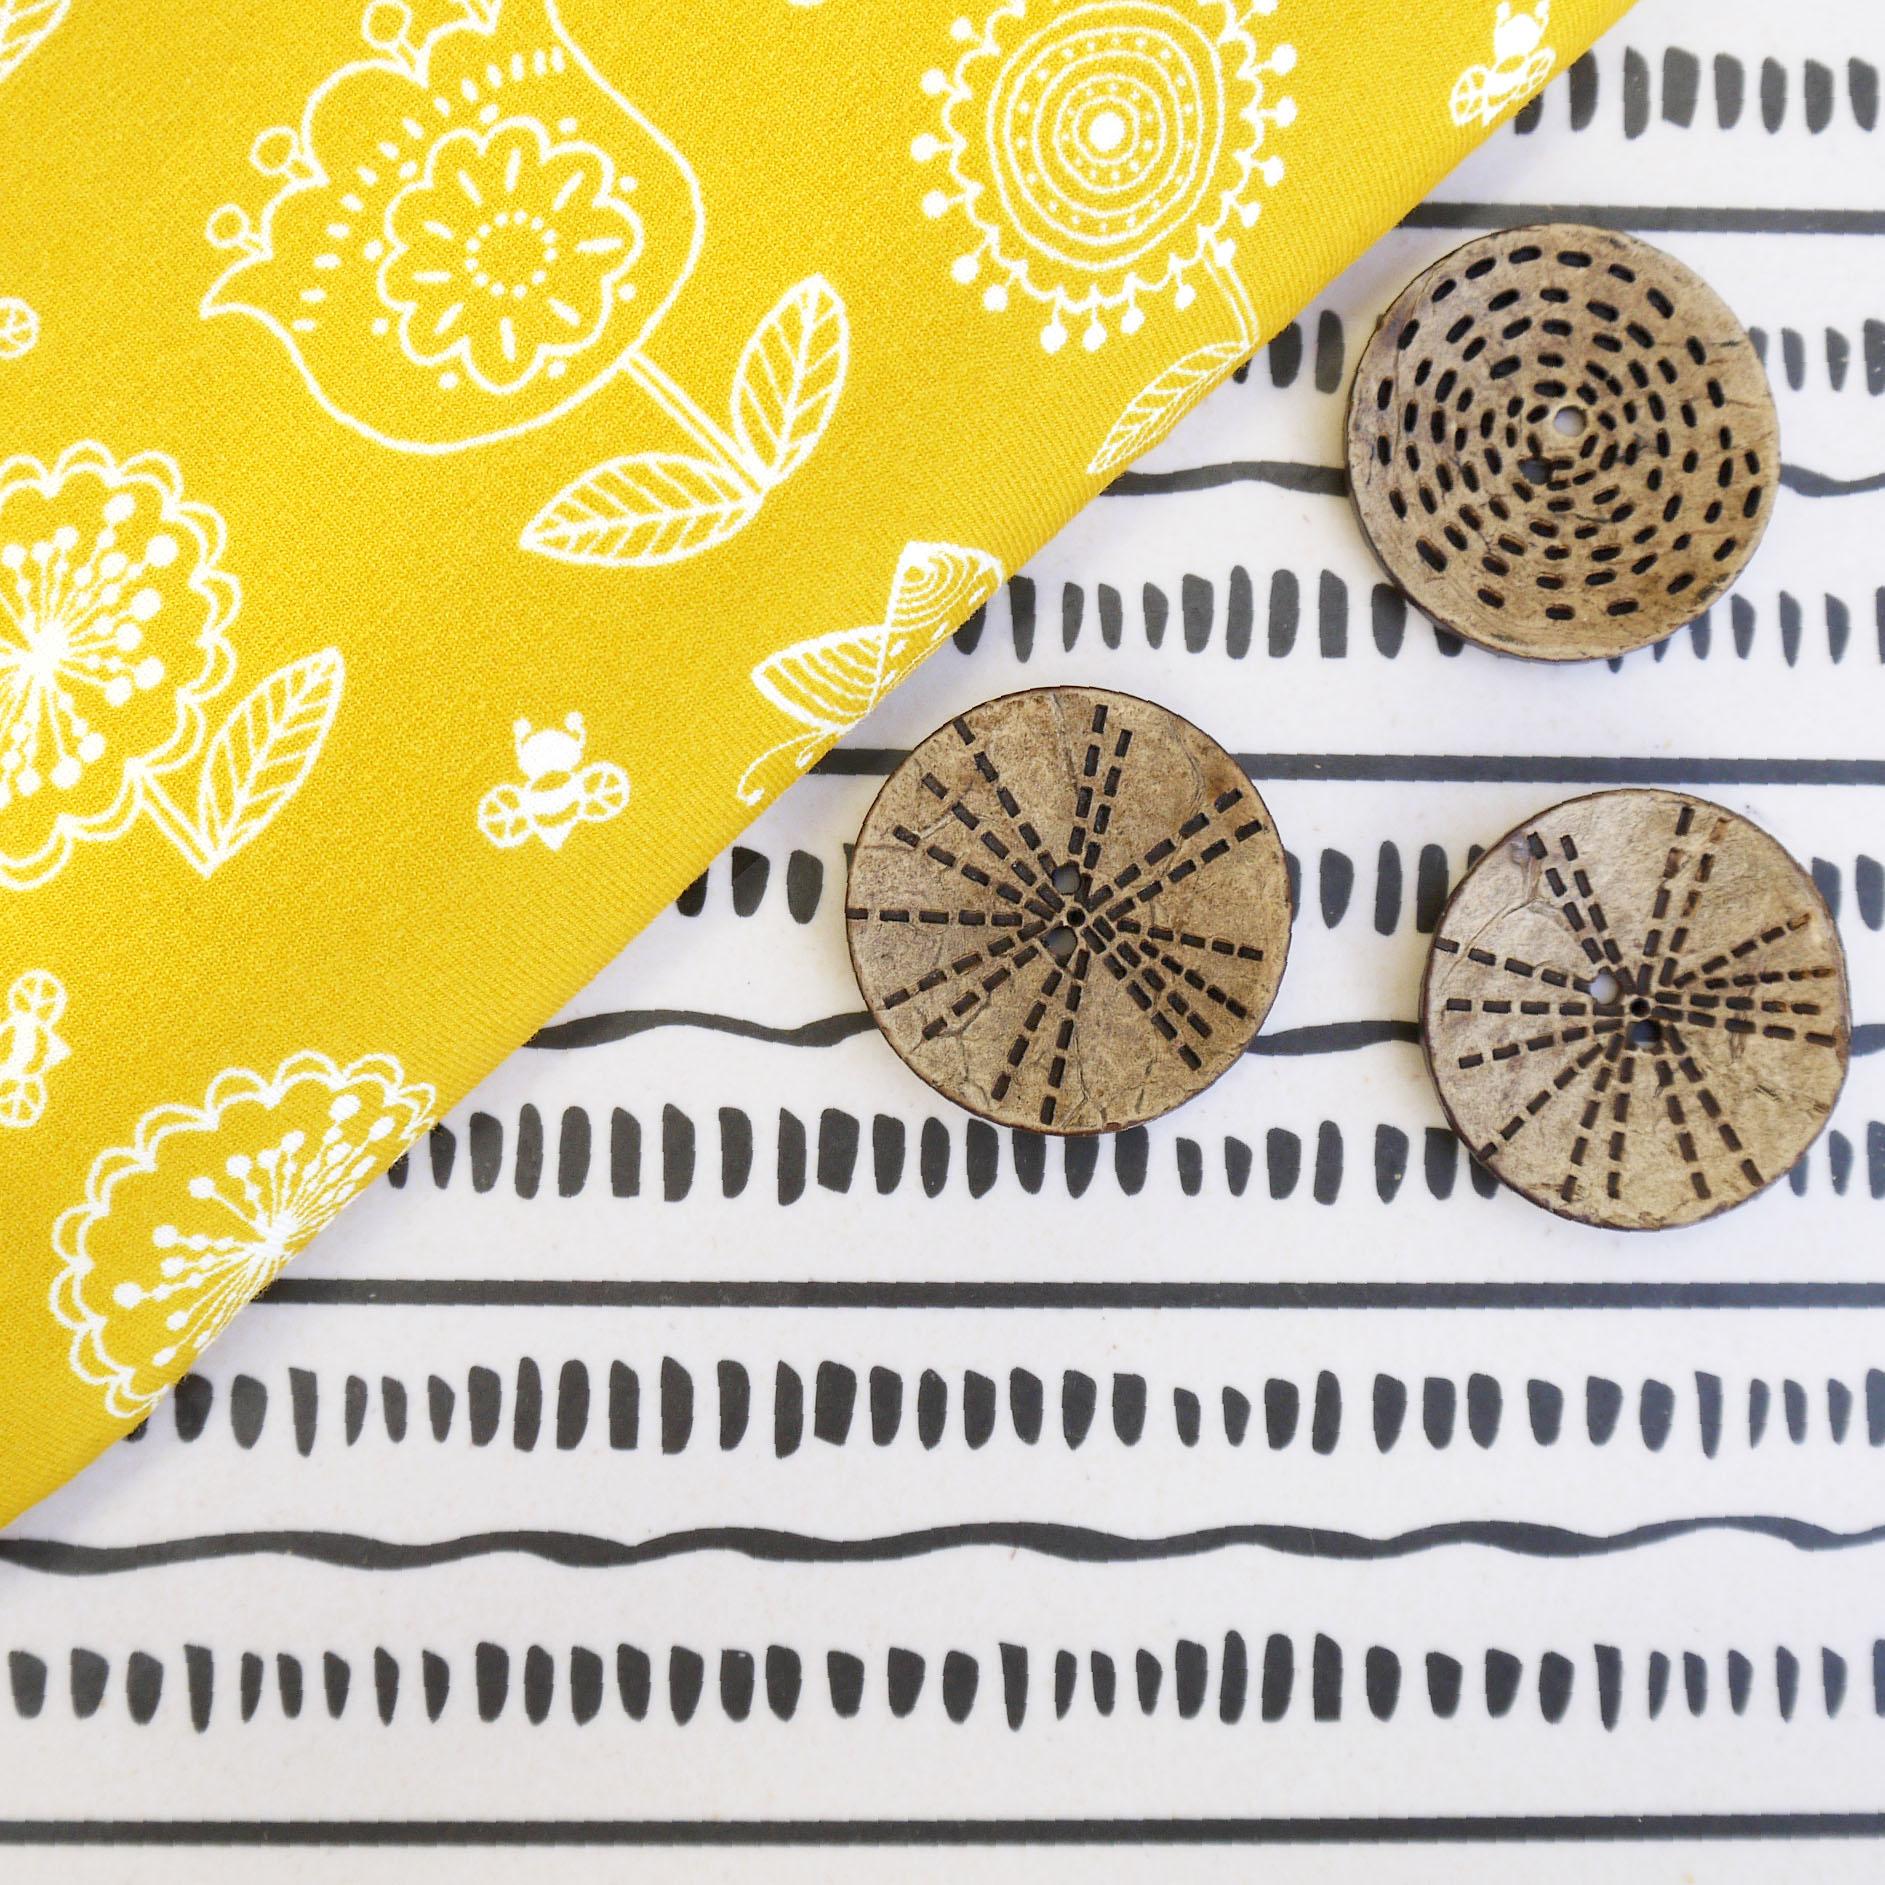 Tidöblomma Rebekah Ginda Design Blomängen Jersey Fabric Stoffe Kokosknöpfe